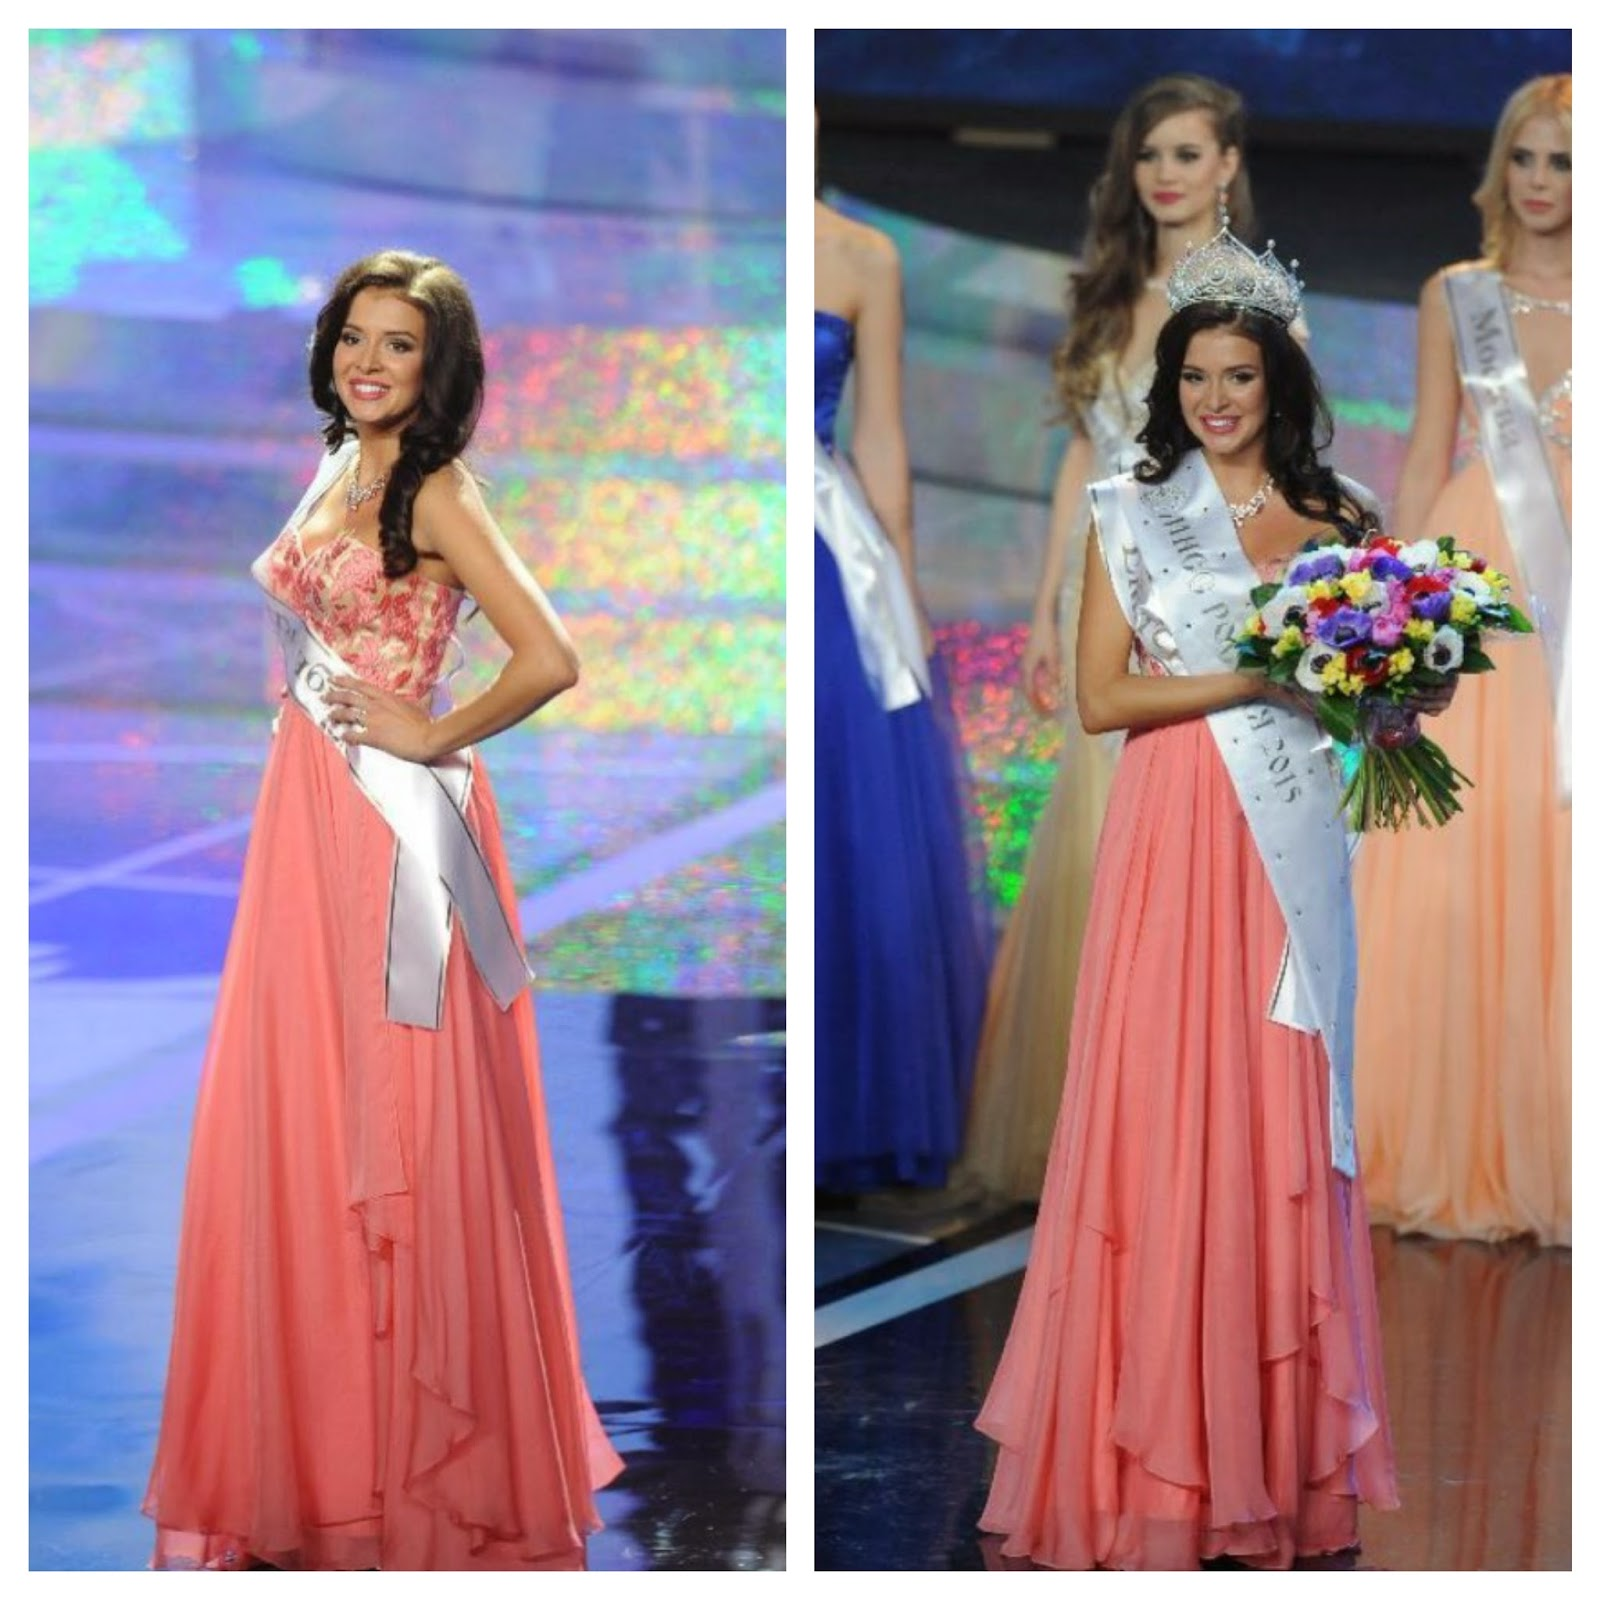 Russian Prom Dresses